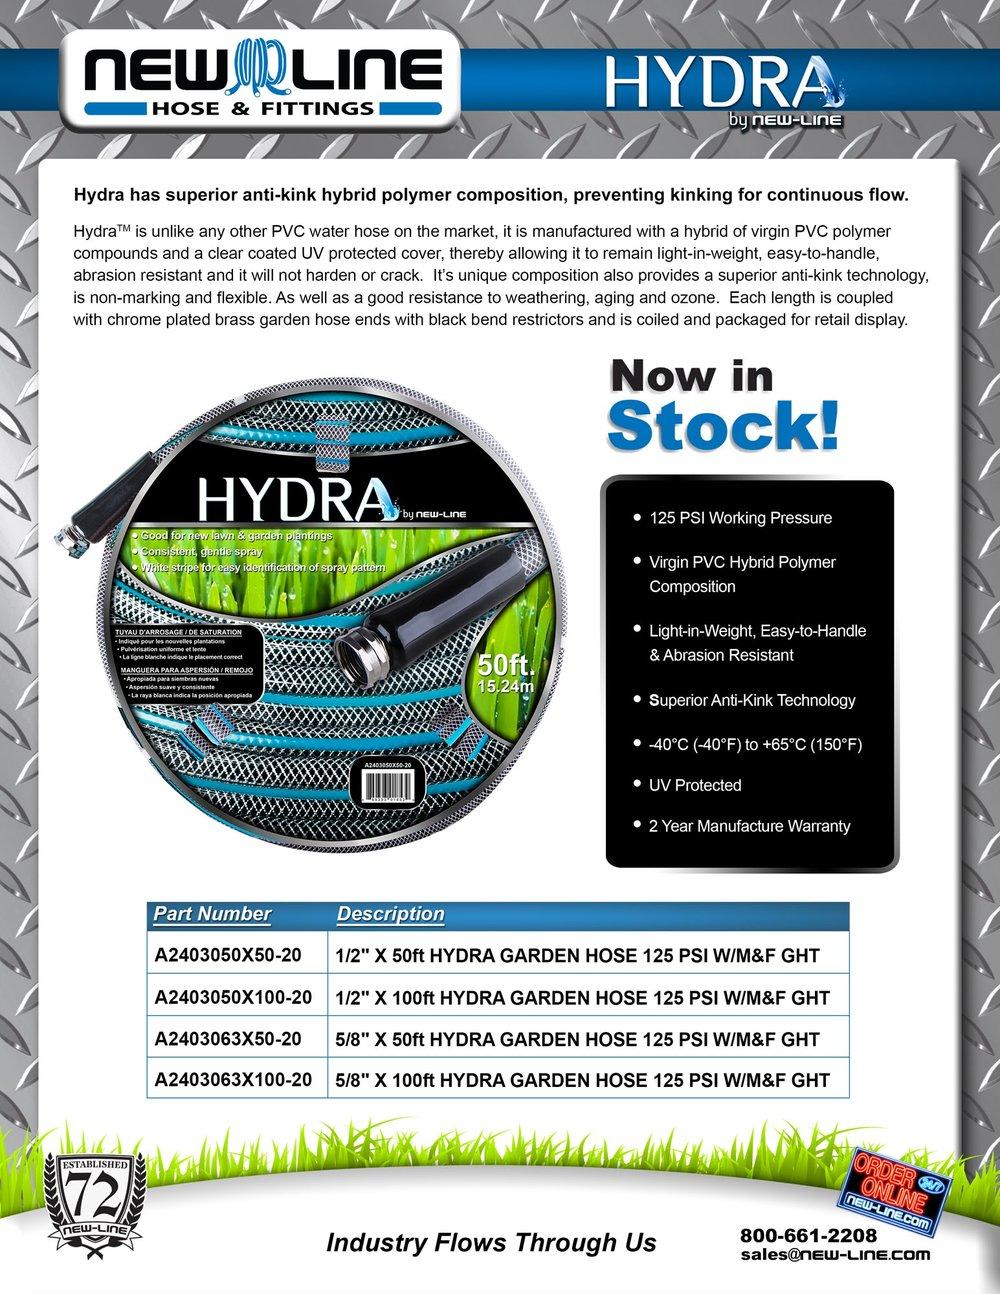 Hydra-Promo-Flyer-NO-PRICING---Apr-13-15.jpg